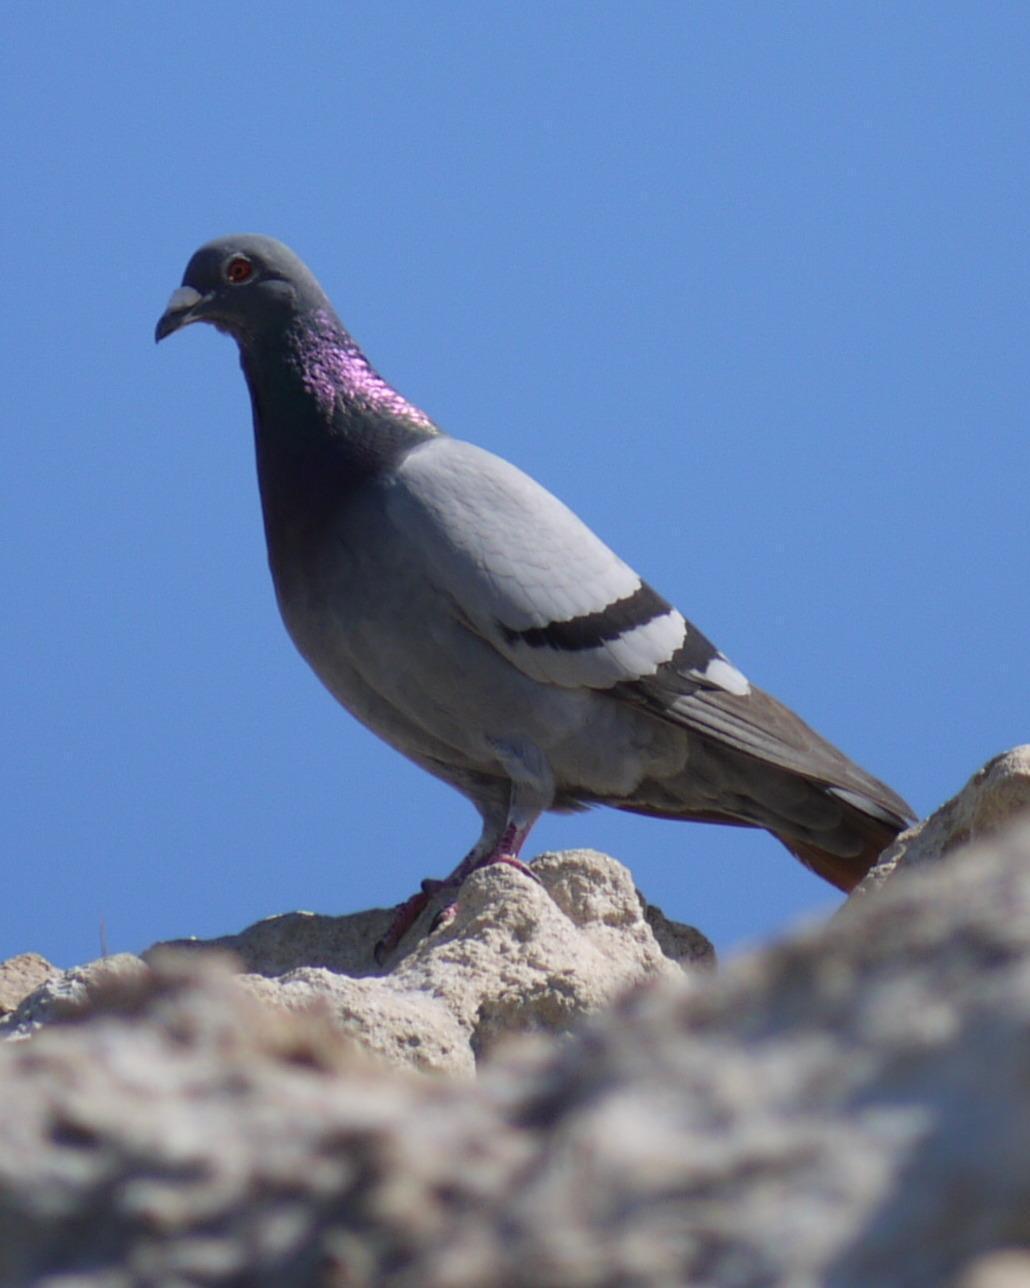 Rock Pigeon Photo by Peter Lowe